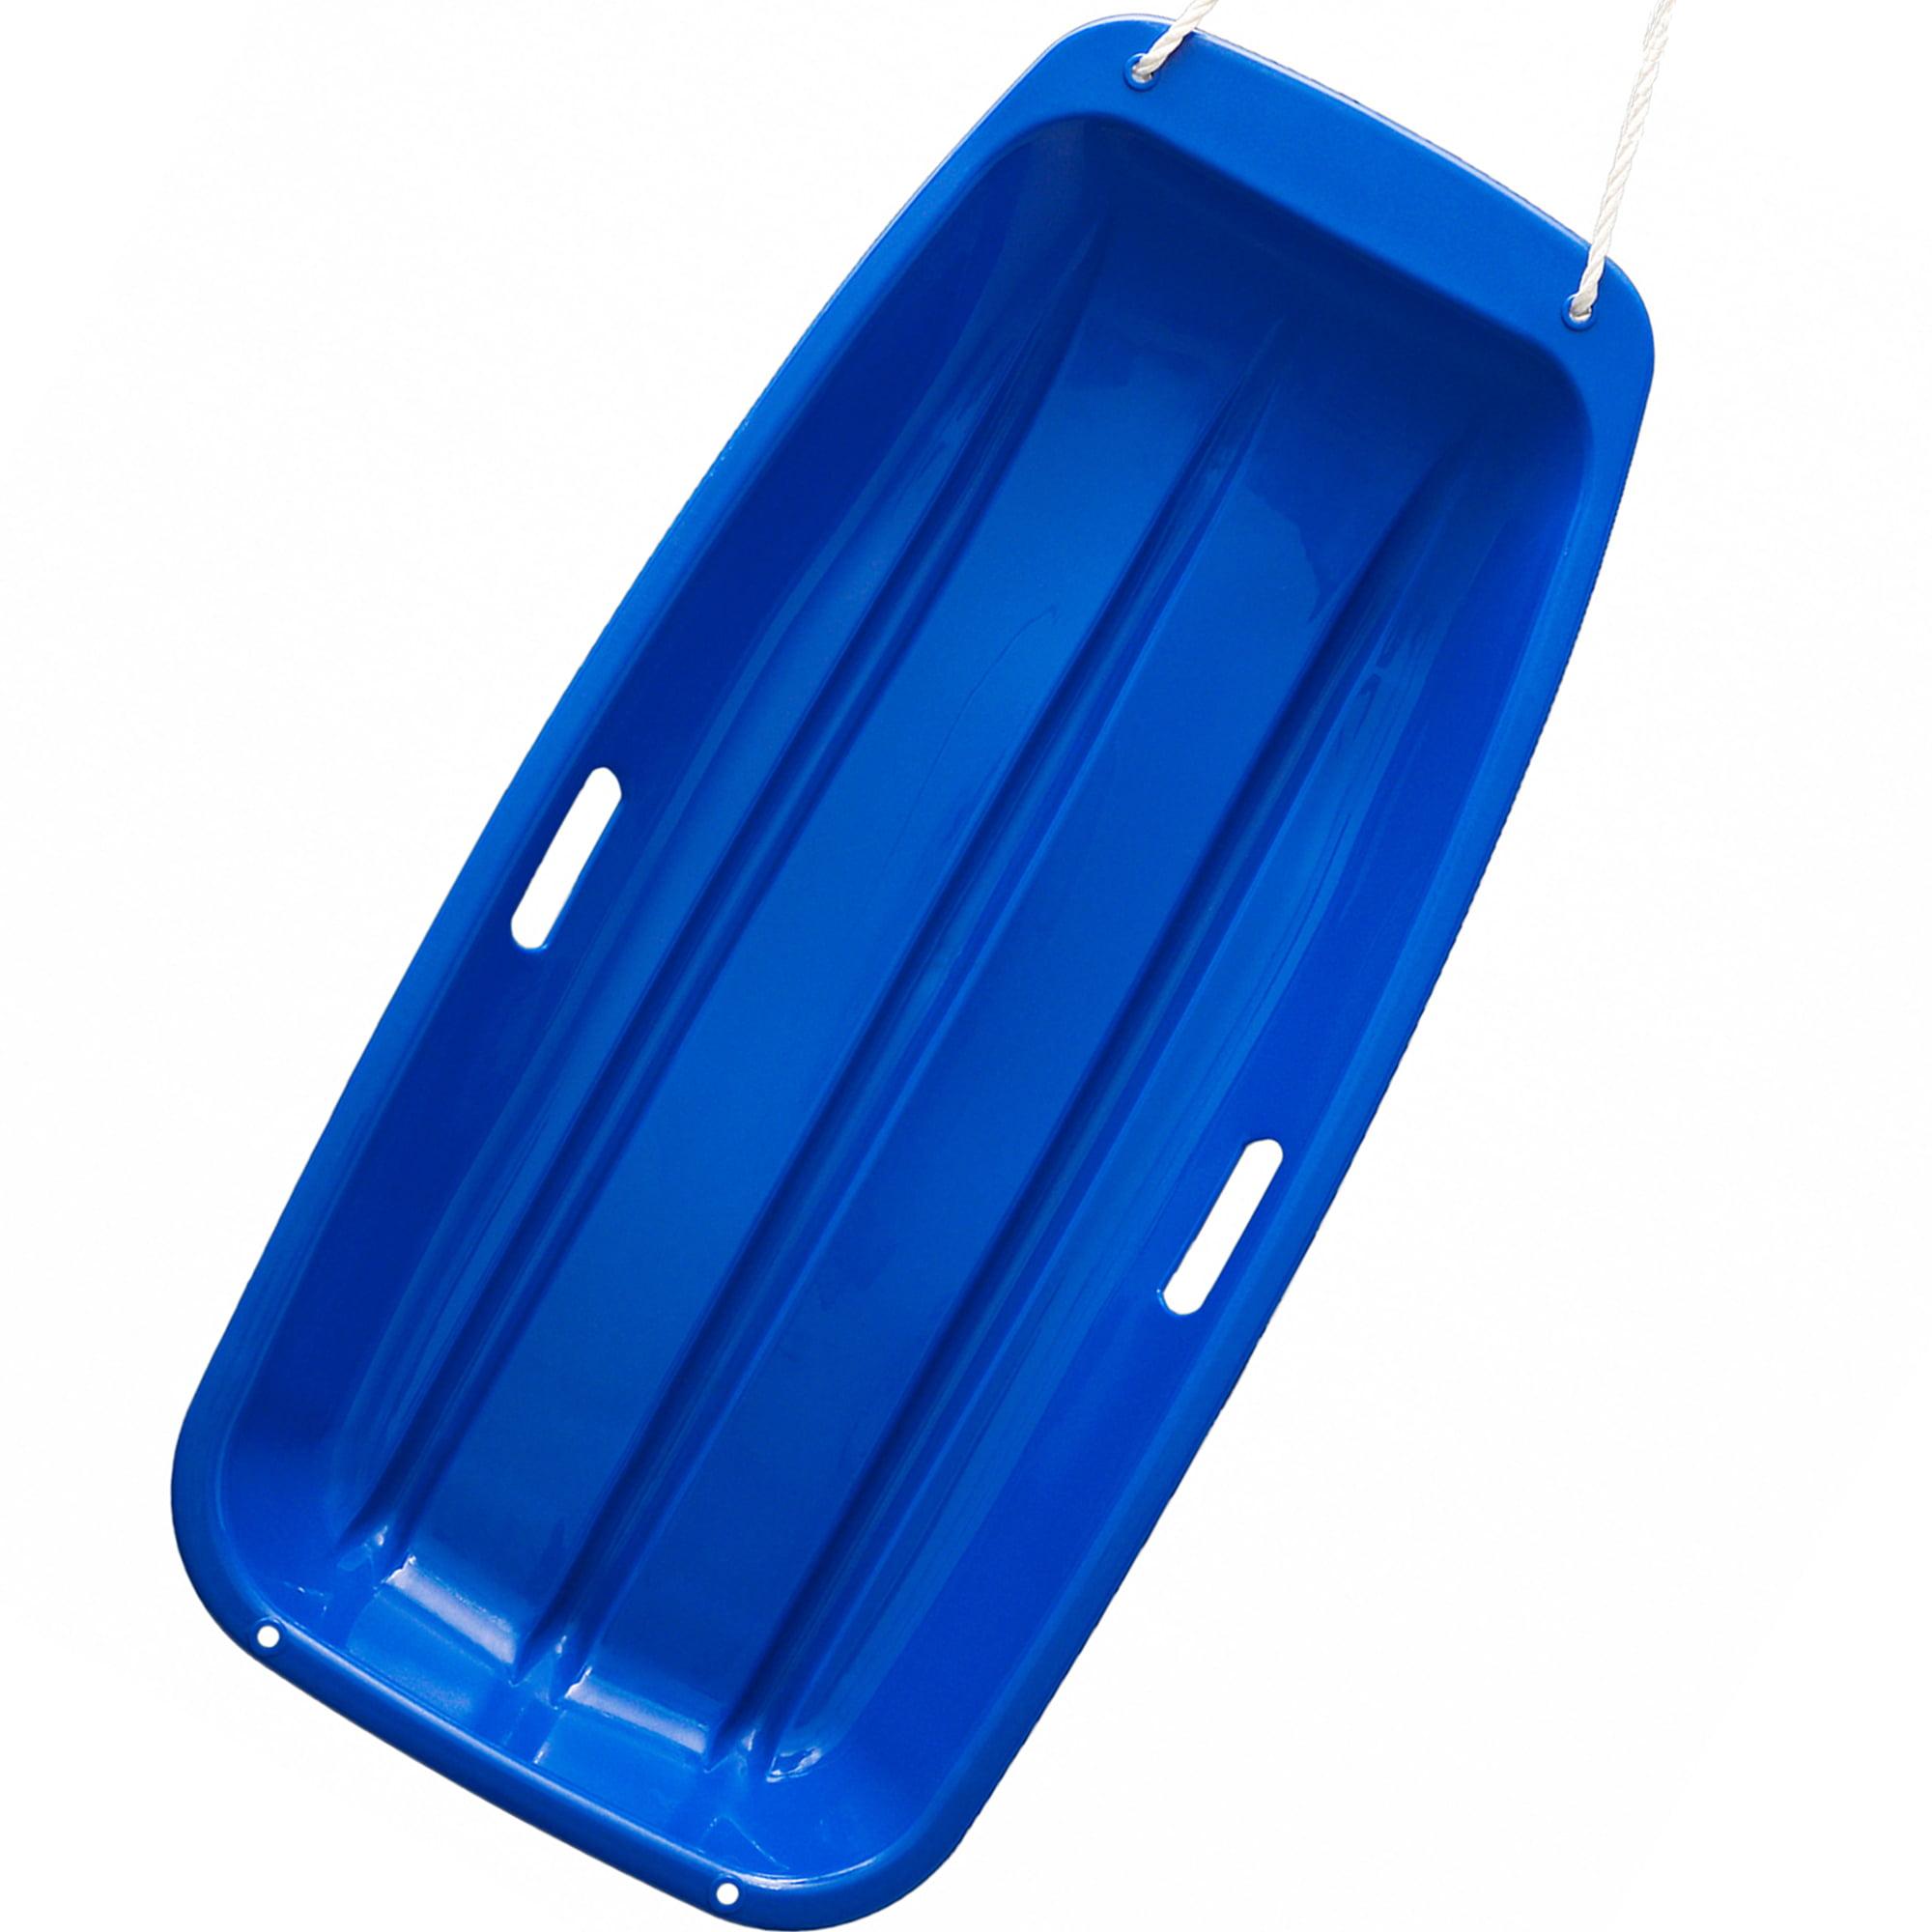 "IMage 35"" Kids Snow Sled Plastic Toboggan Boat Sledge Snowboard Blue 35*17*4.3inch by"